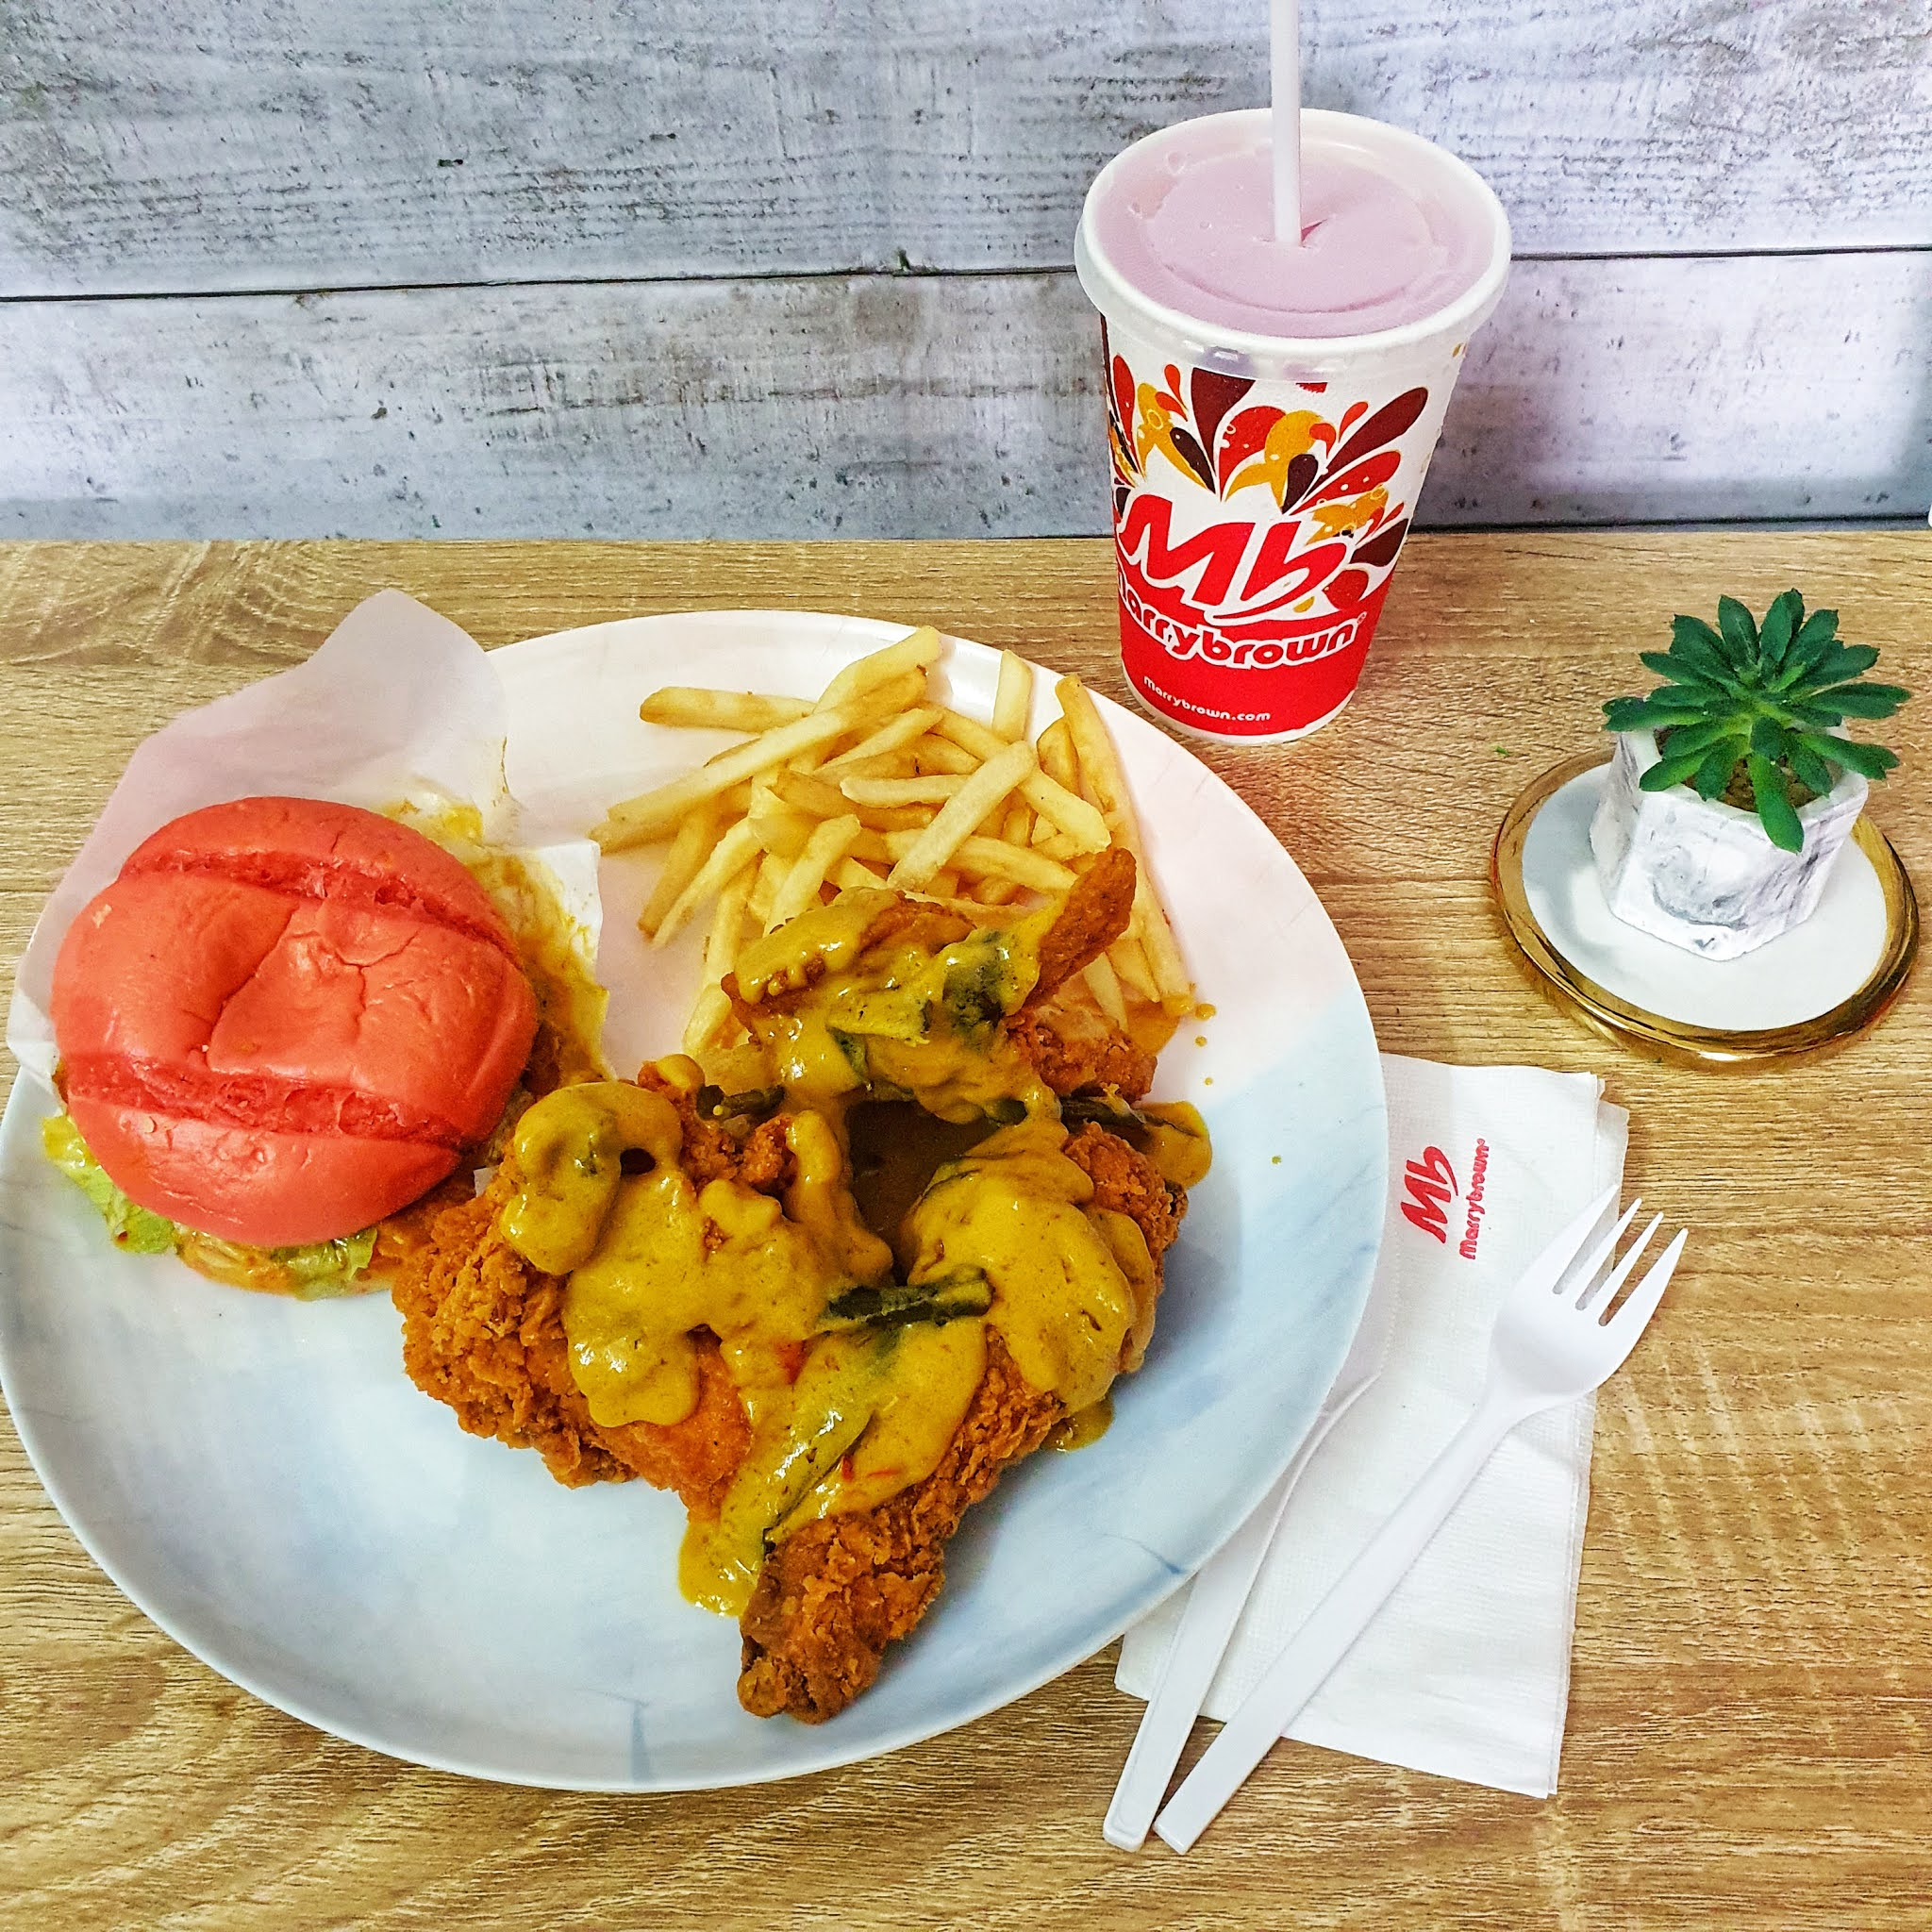 Marrybrown Malaysia, Menu baru marrybrown malaysia, marrybrown egg-stra ong meal, marrybrown burger pink, burger pink mb review, mb salted egg review,